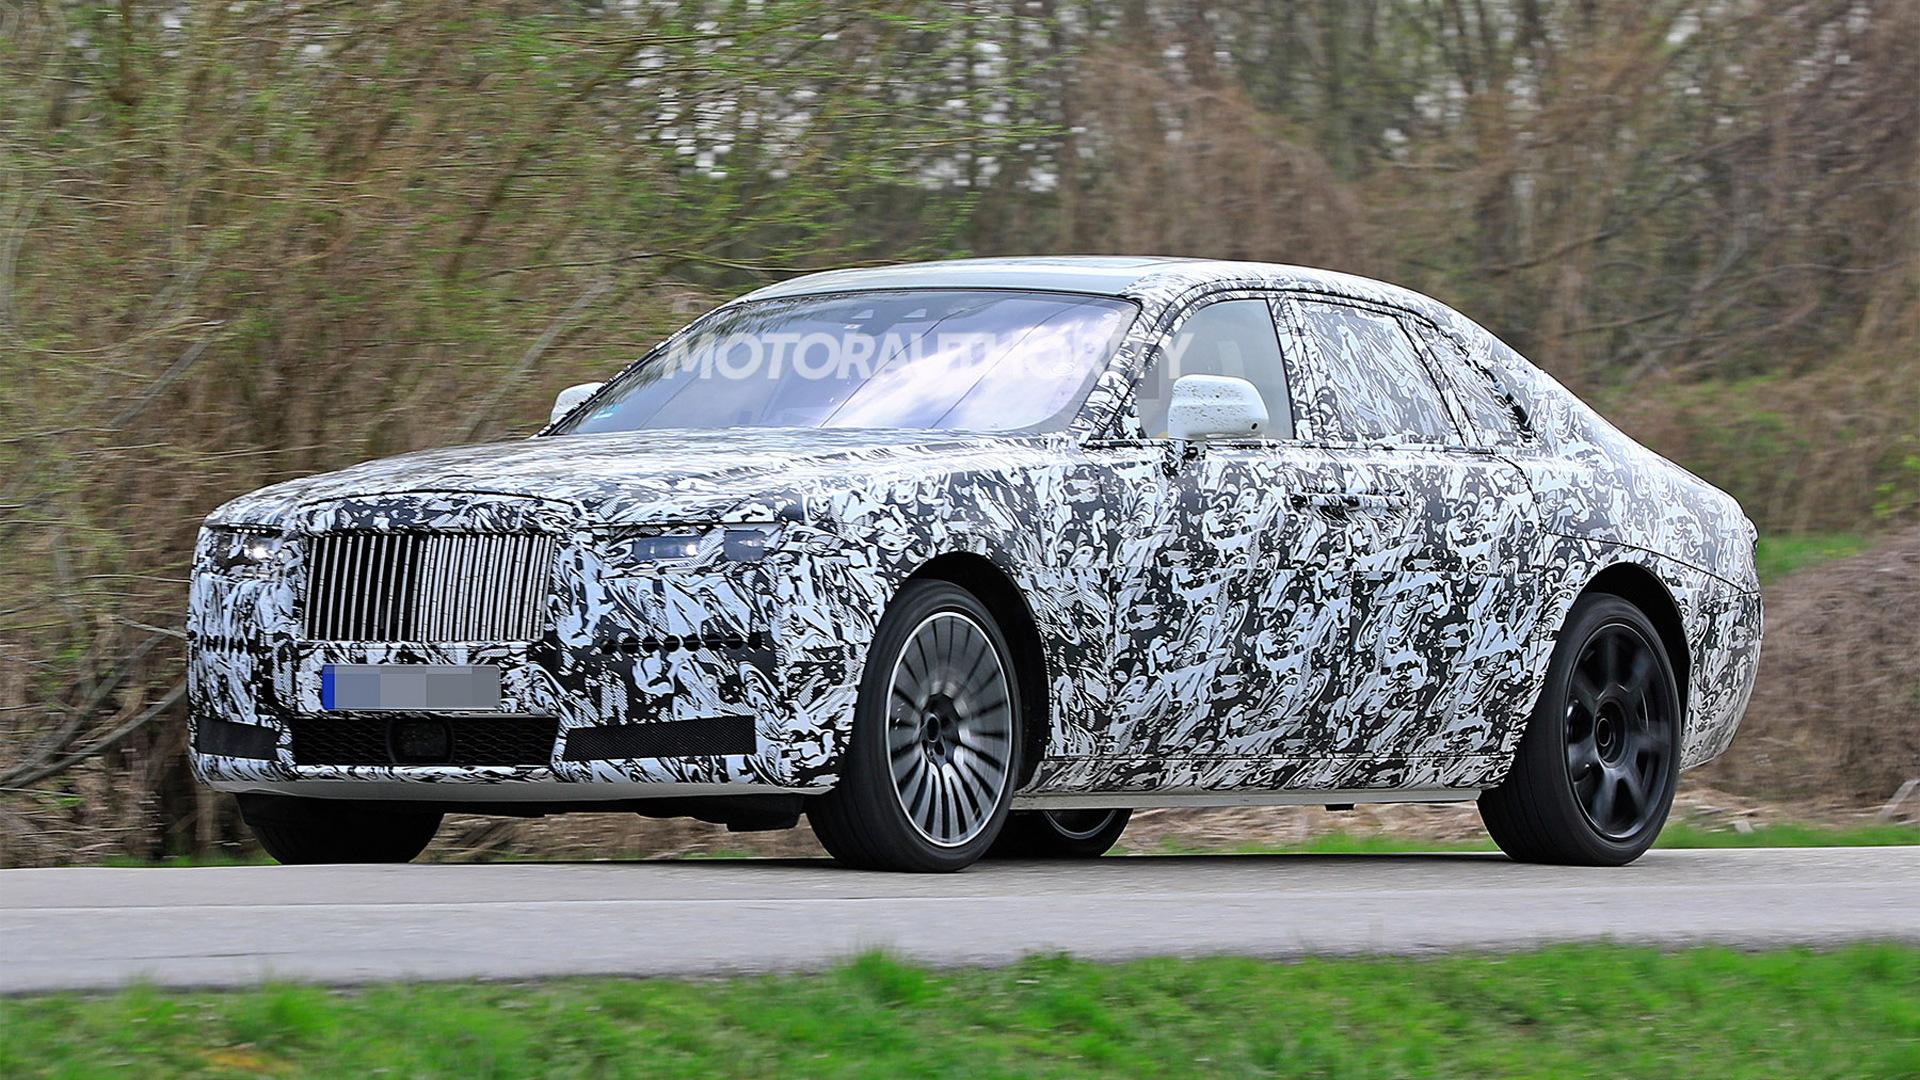 2021 Rolls-Royce Ghost spy shots - Image via S. Baldauf/SB-Medien